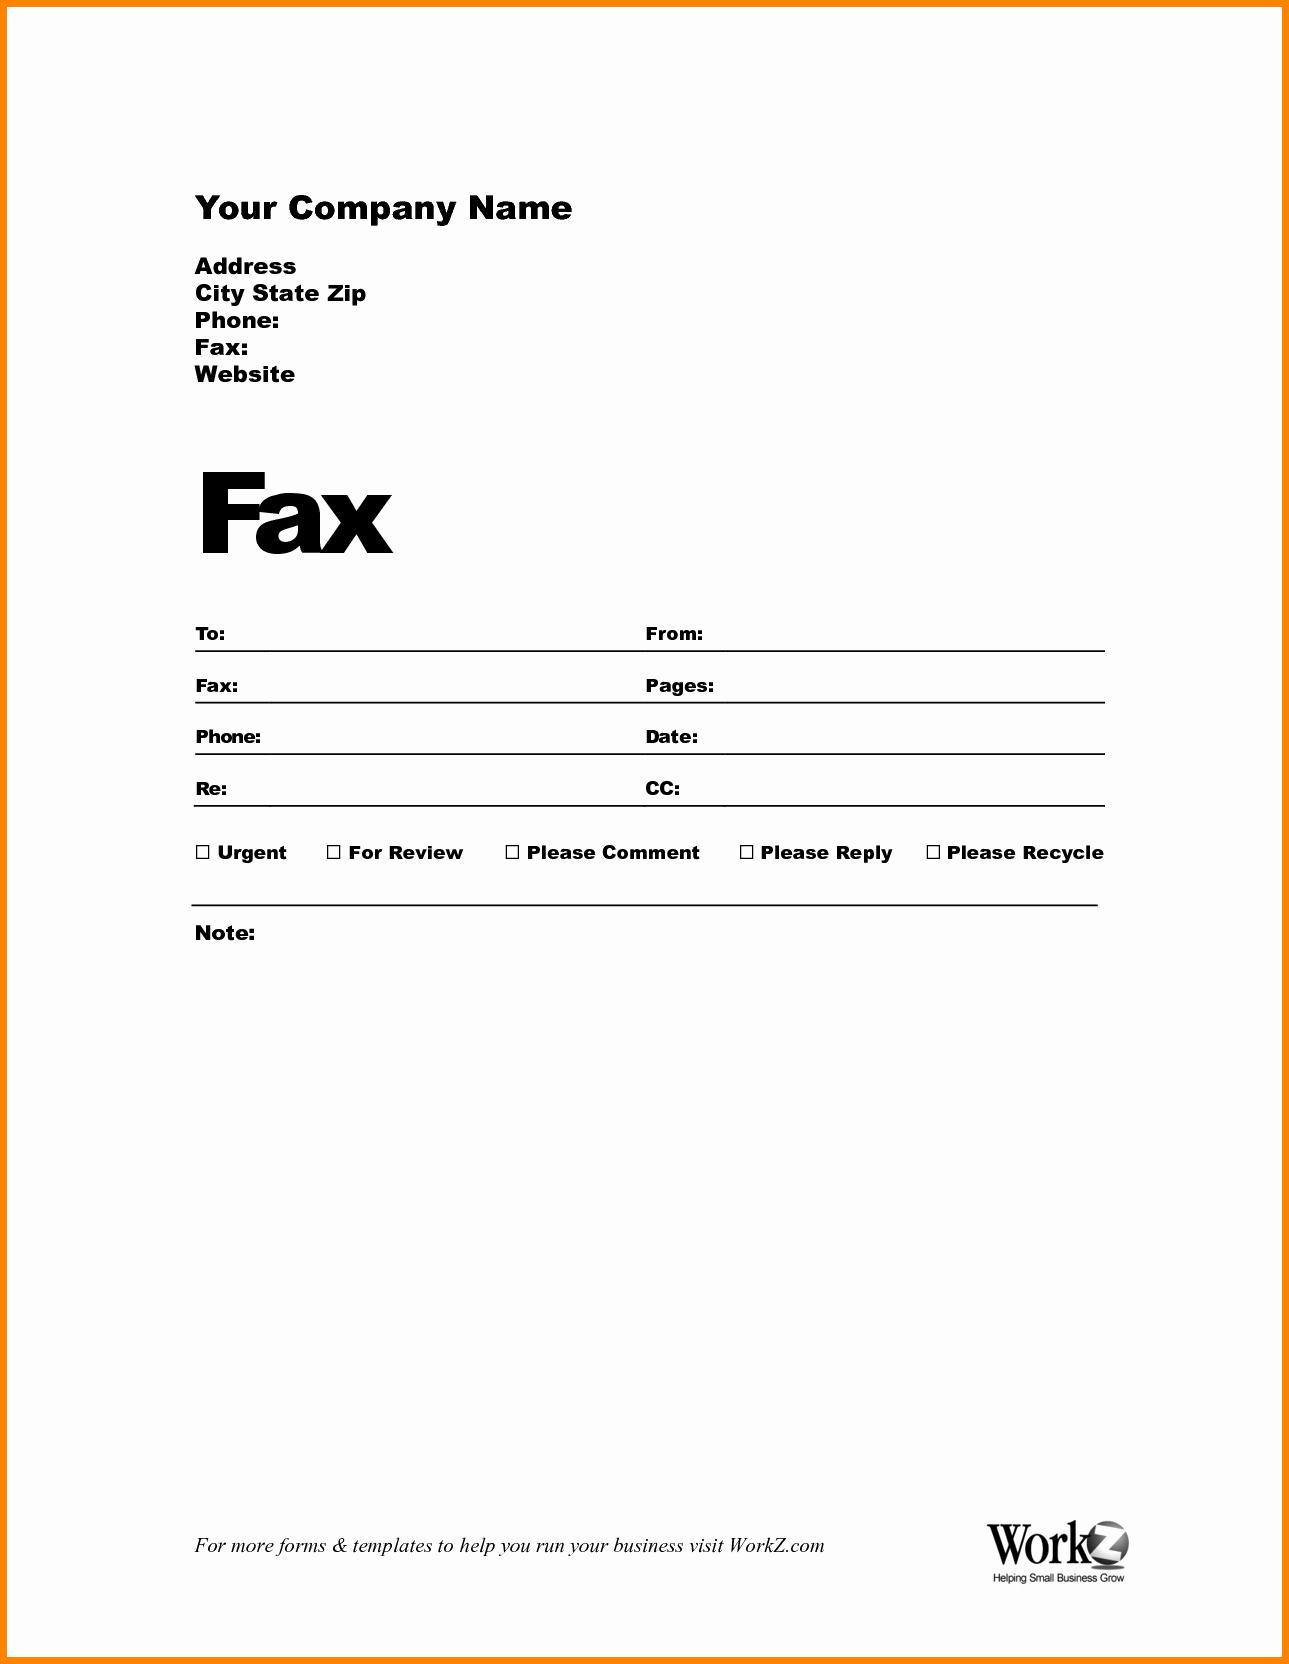 Fax Cover Sheet Word Template Beautiful Fax Cover Template Word Portablegasgrillweber